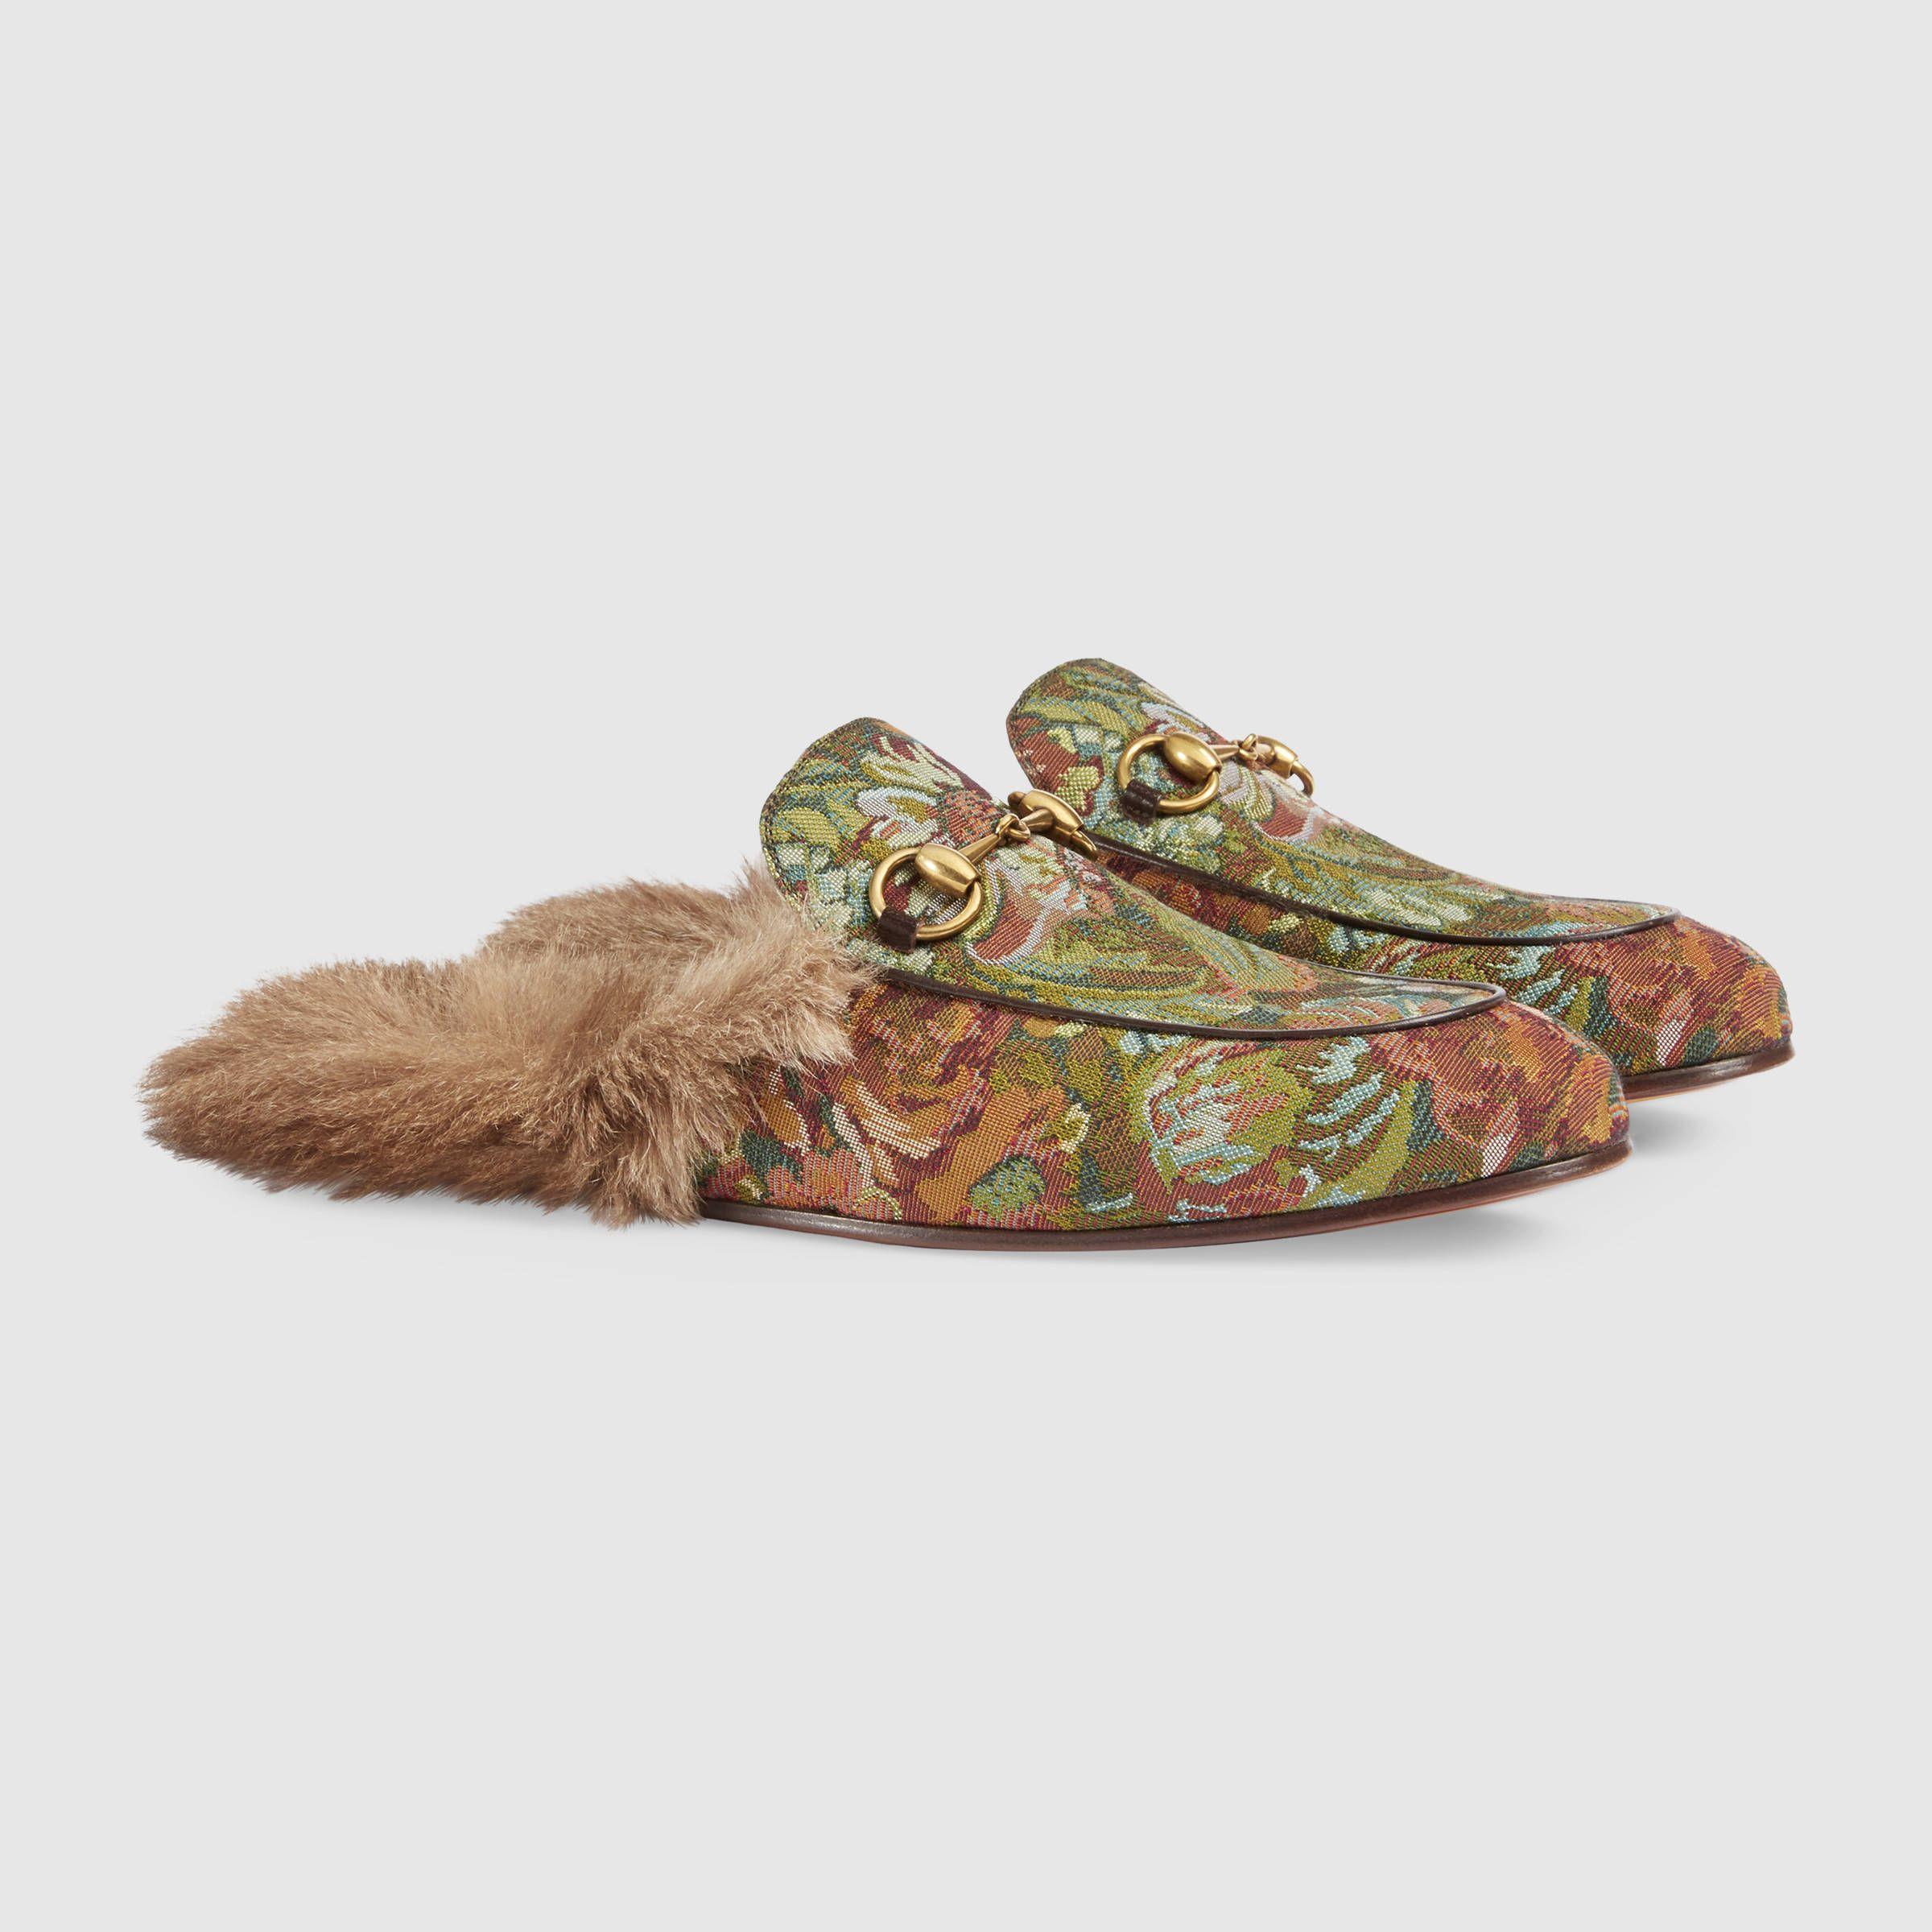 Slippers en cuir et fourrureGucci tRx7Vn